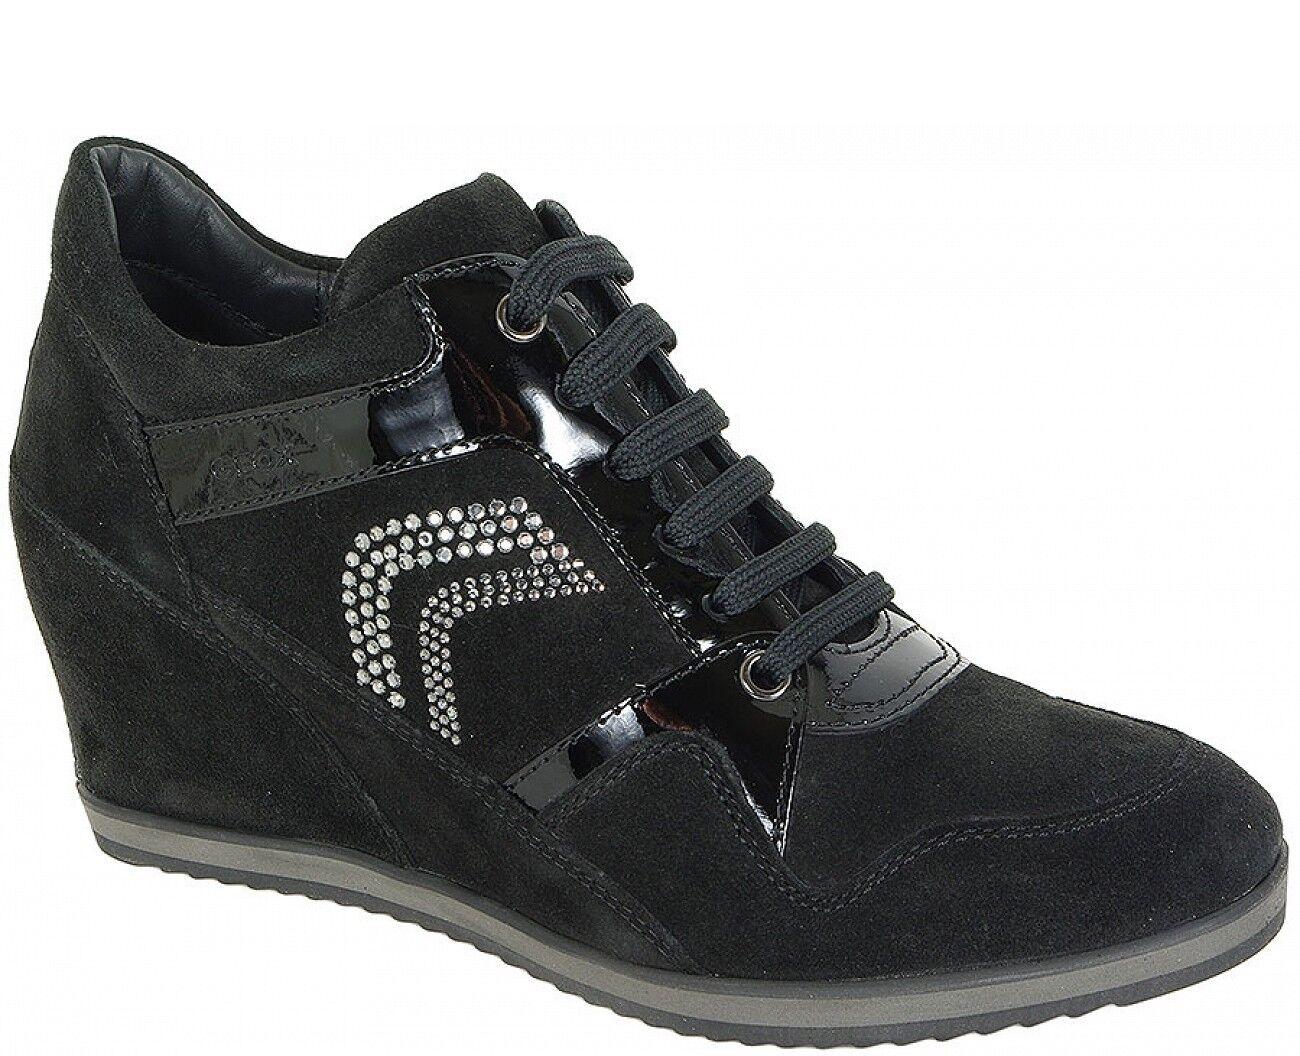 Geox sale sneakers ilusión pat a Ante + pat ilusión lea Negro d44a2266c9999 0b00be